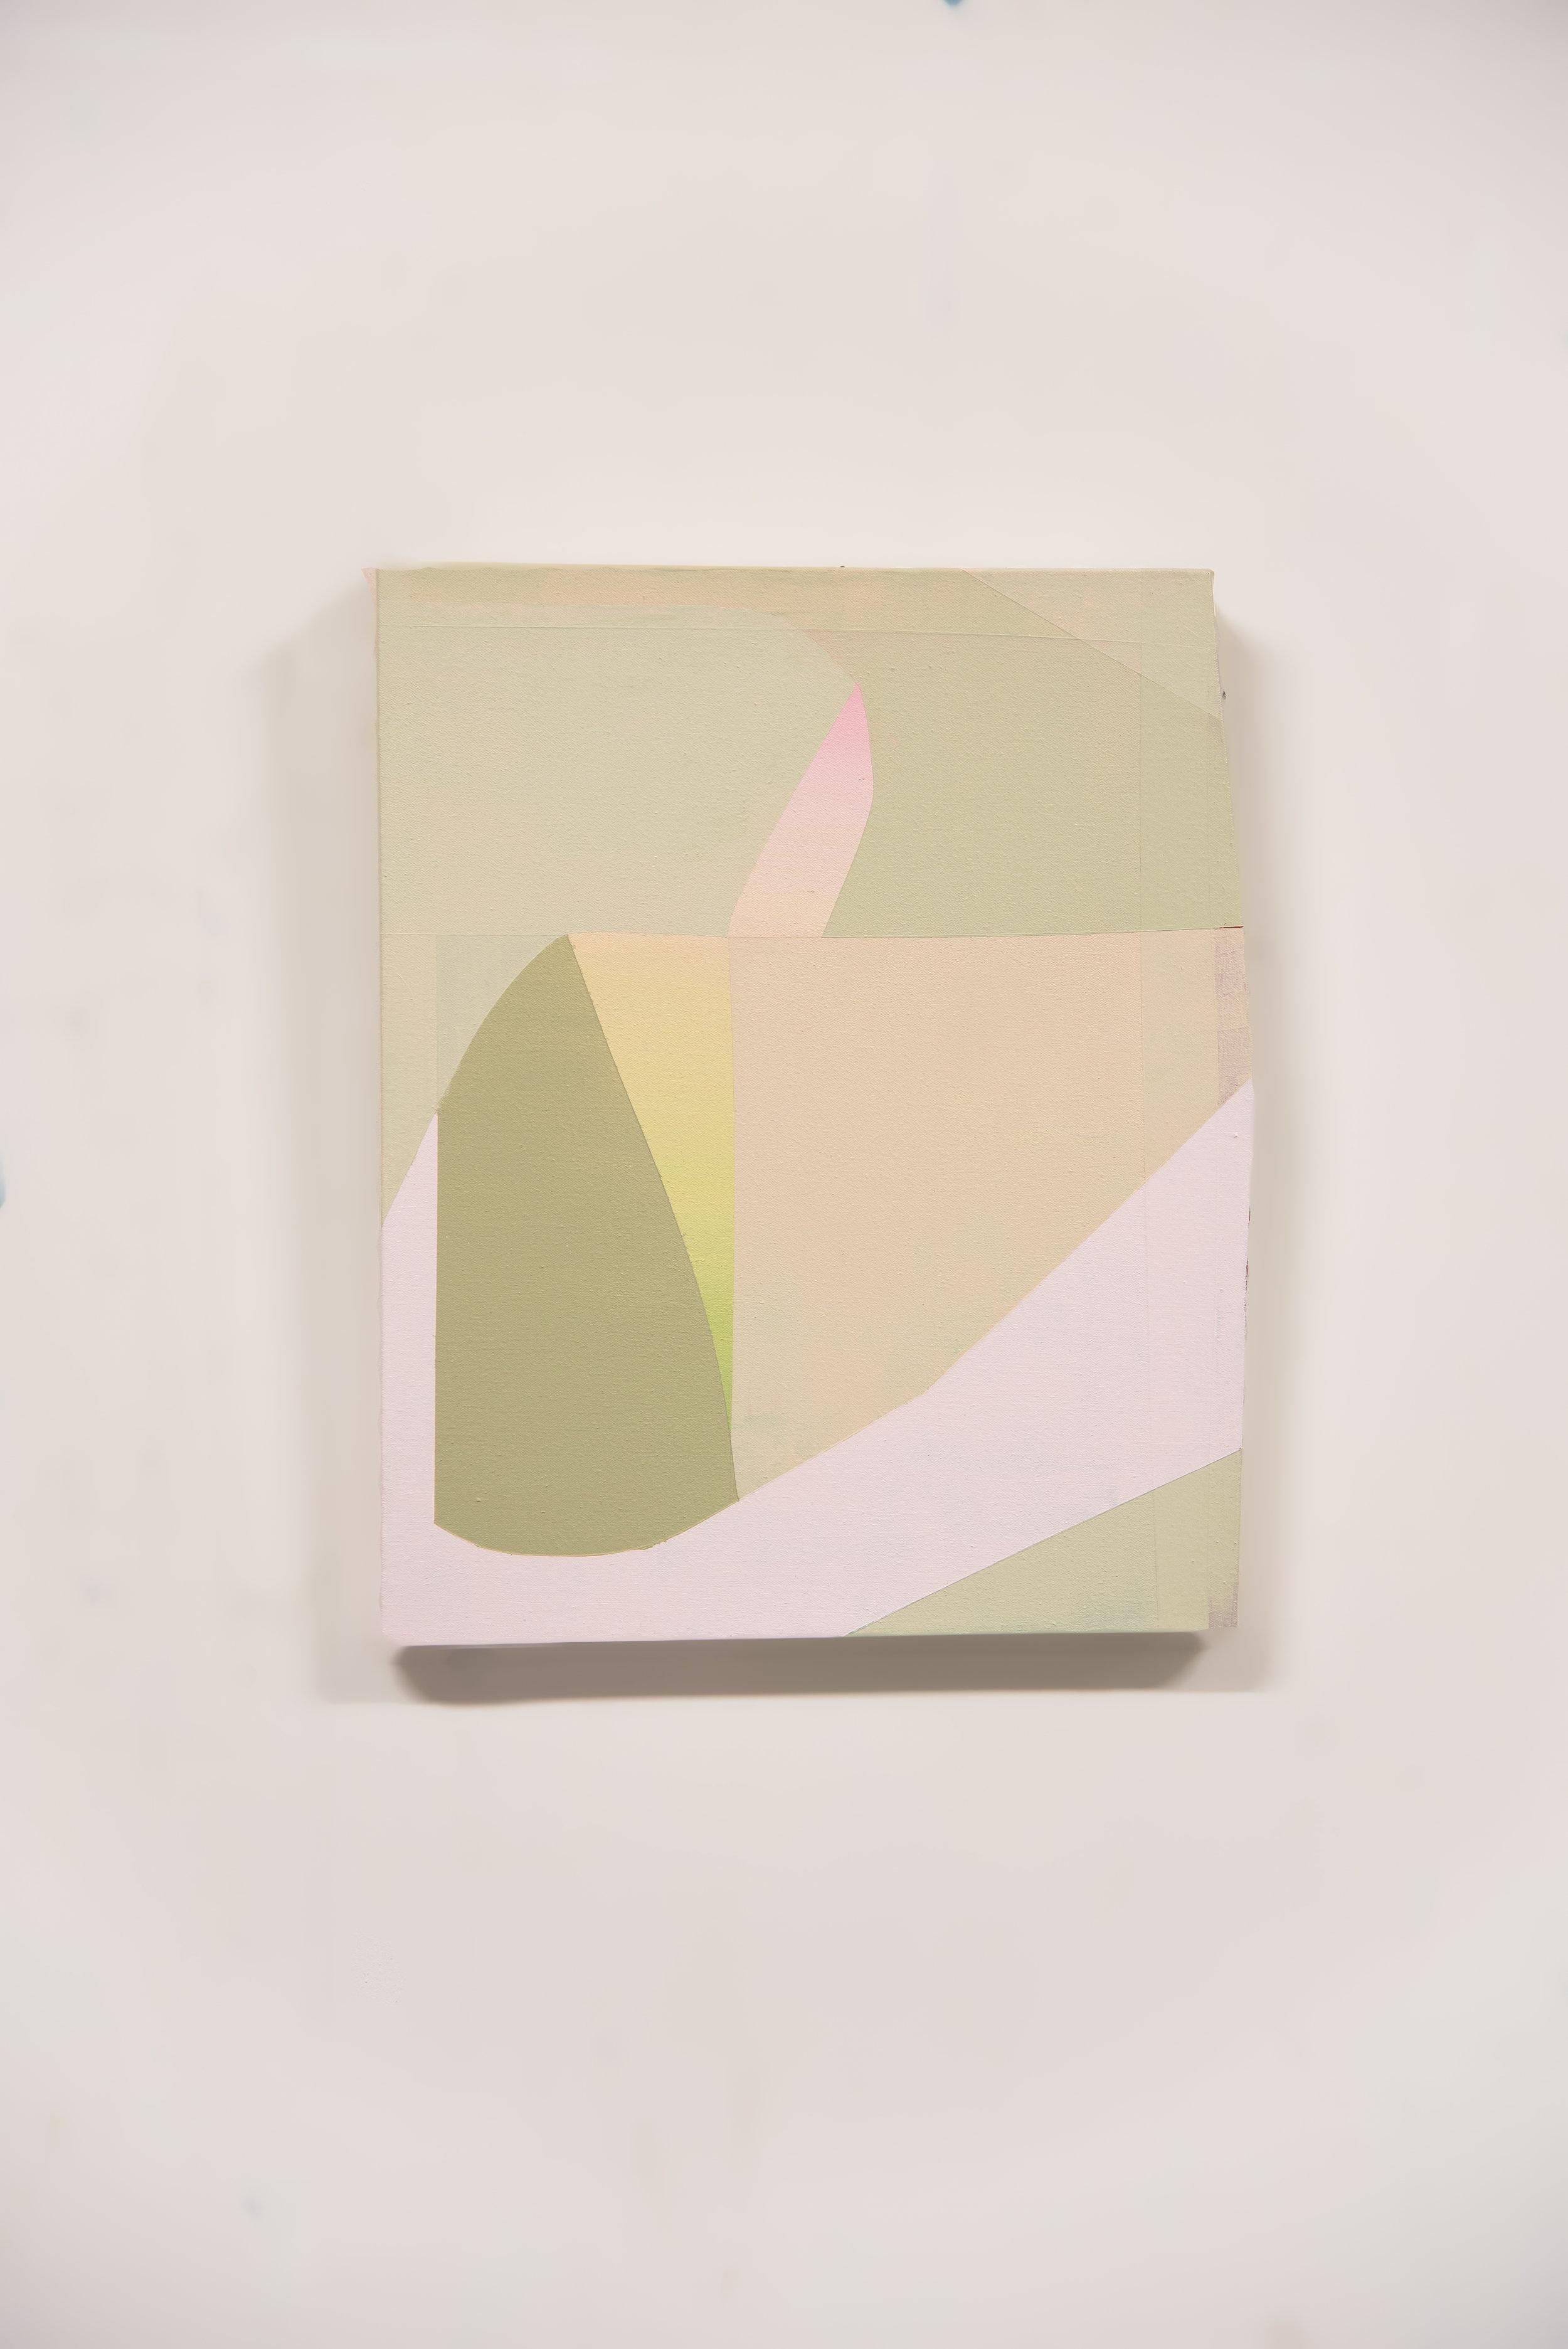 Proximity #3  Acrylic on canvas  18 x 22 in   2019